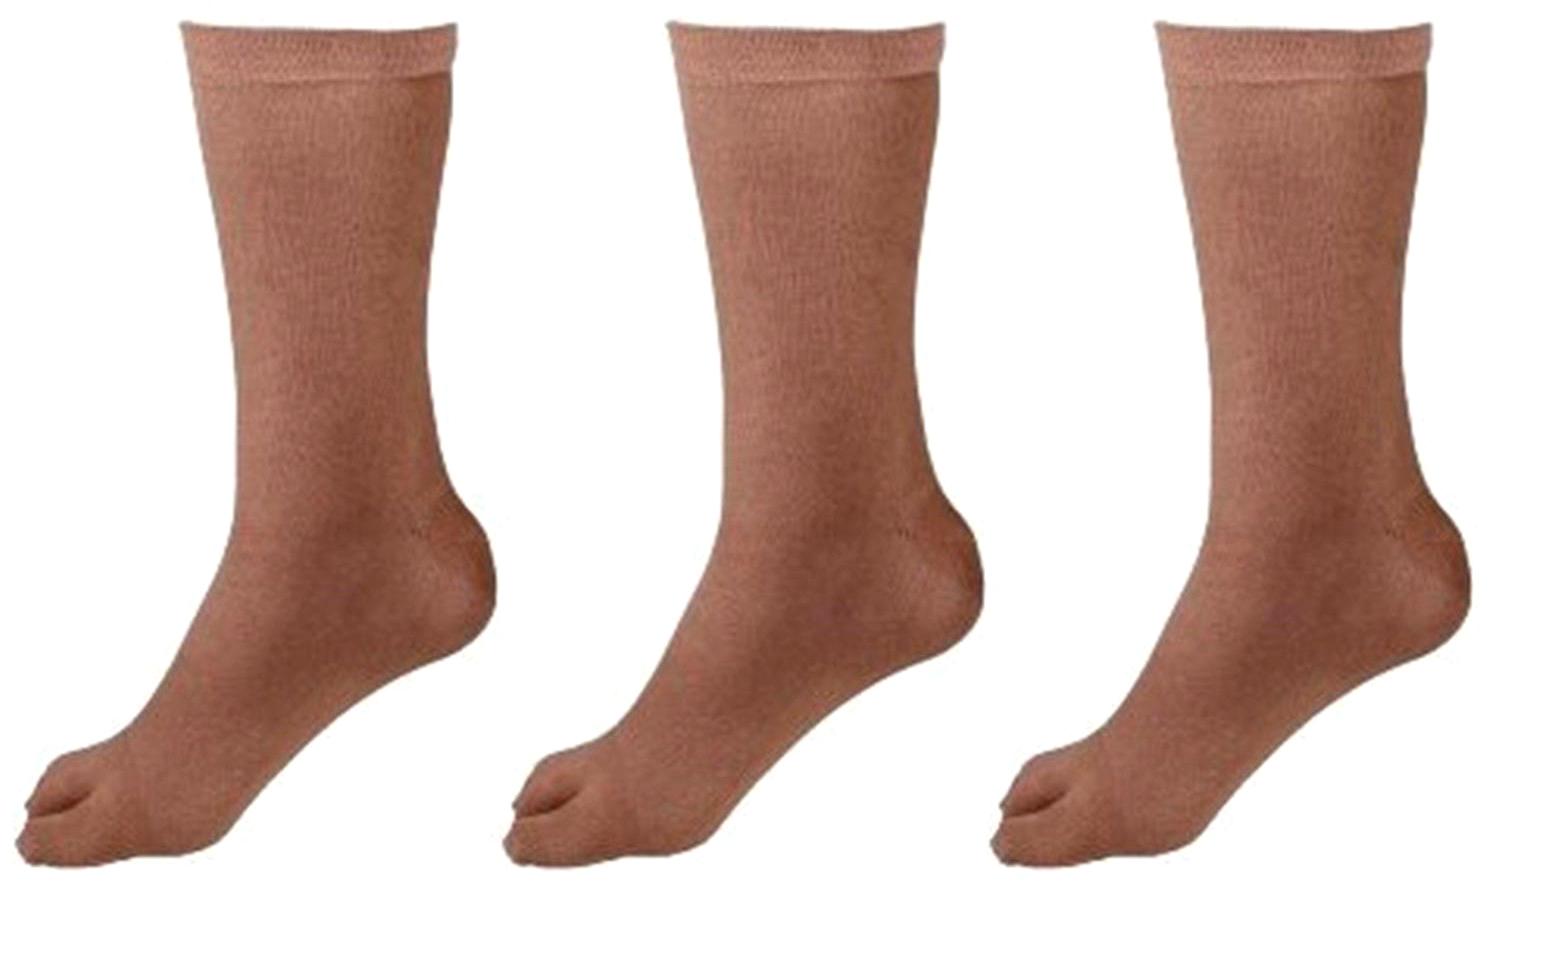 Fashionablecliq Women's Calf Length Skin Color Solid Thumb Cotton Socks Pack of 3